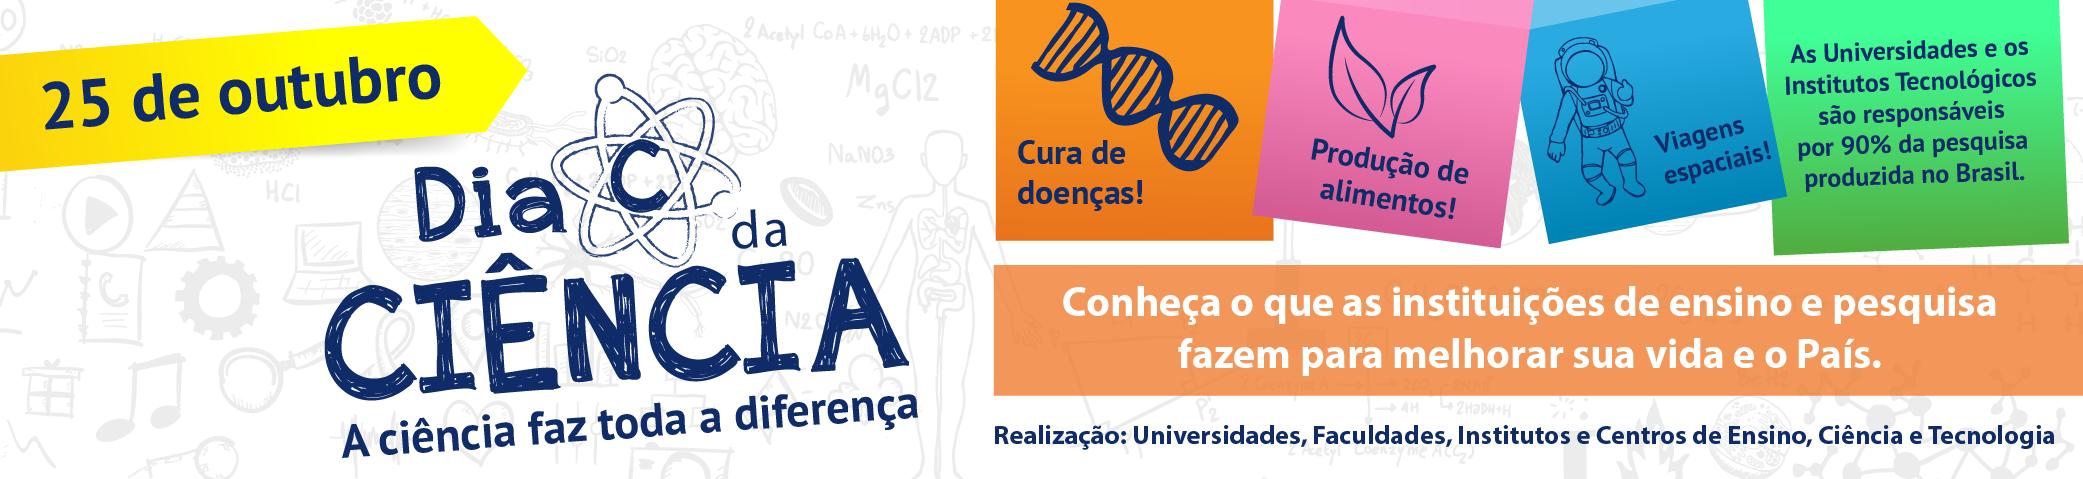 Banner Dia da Ciência